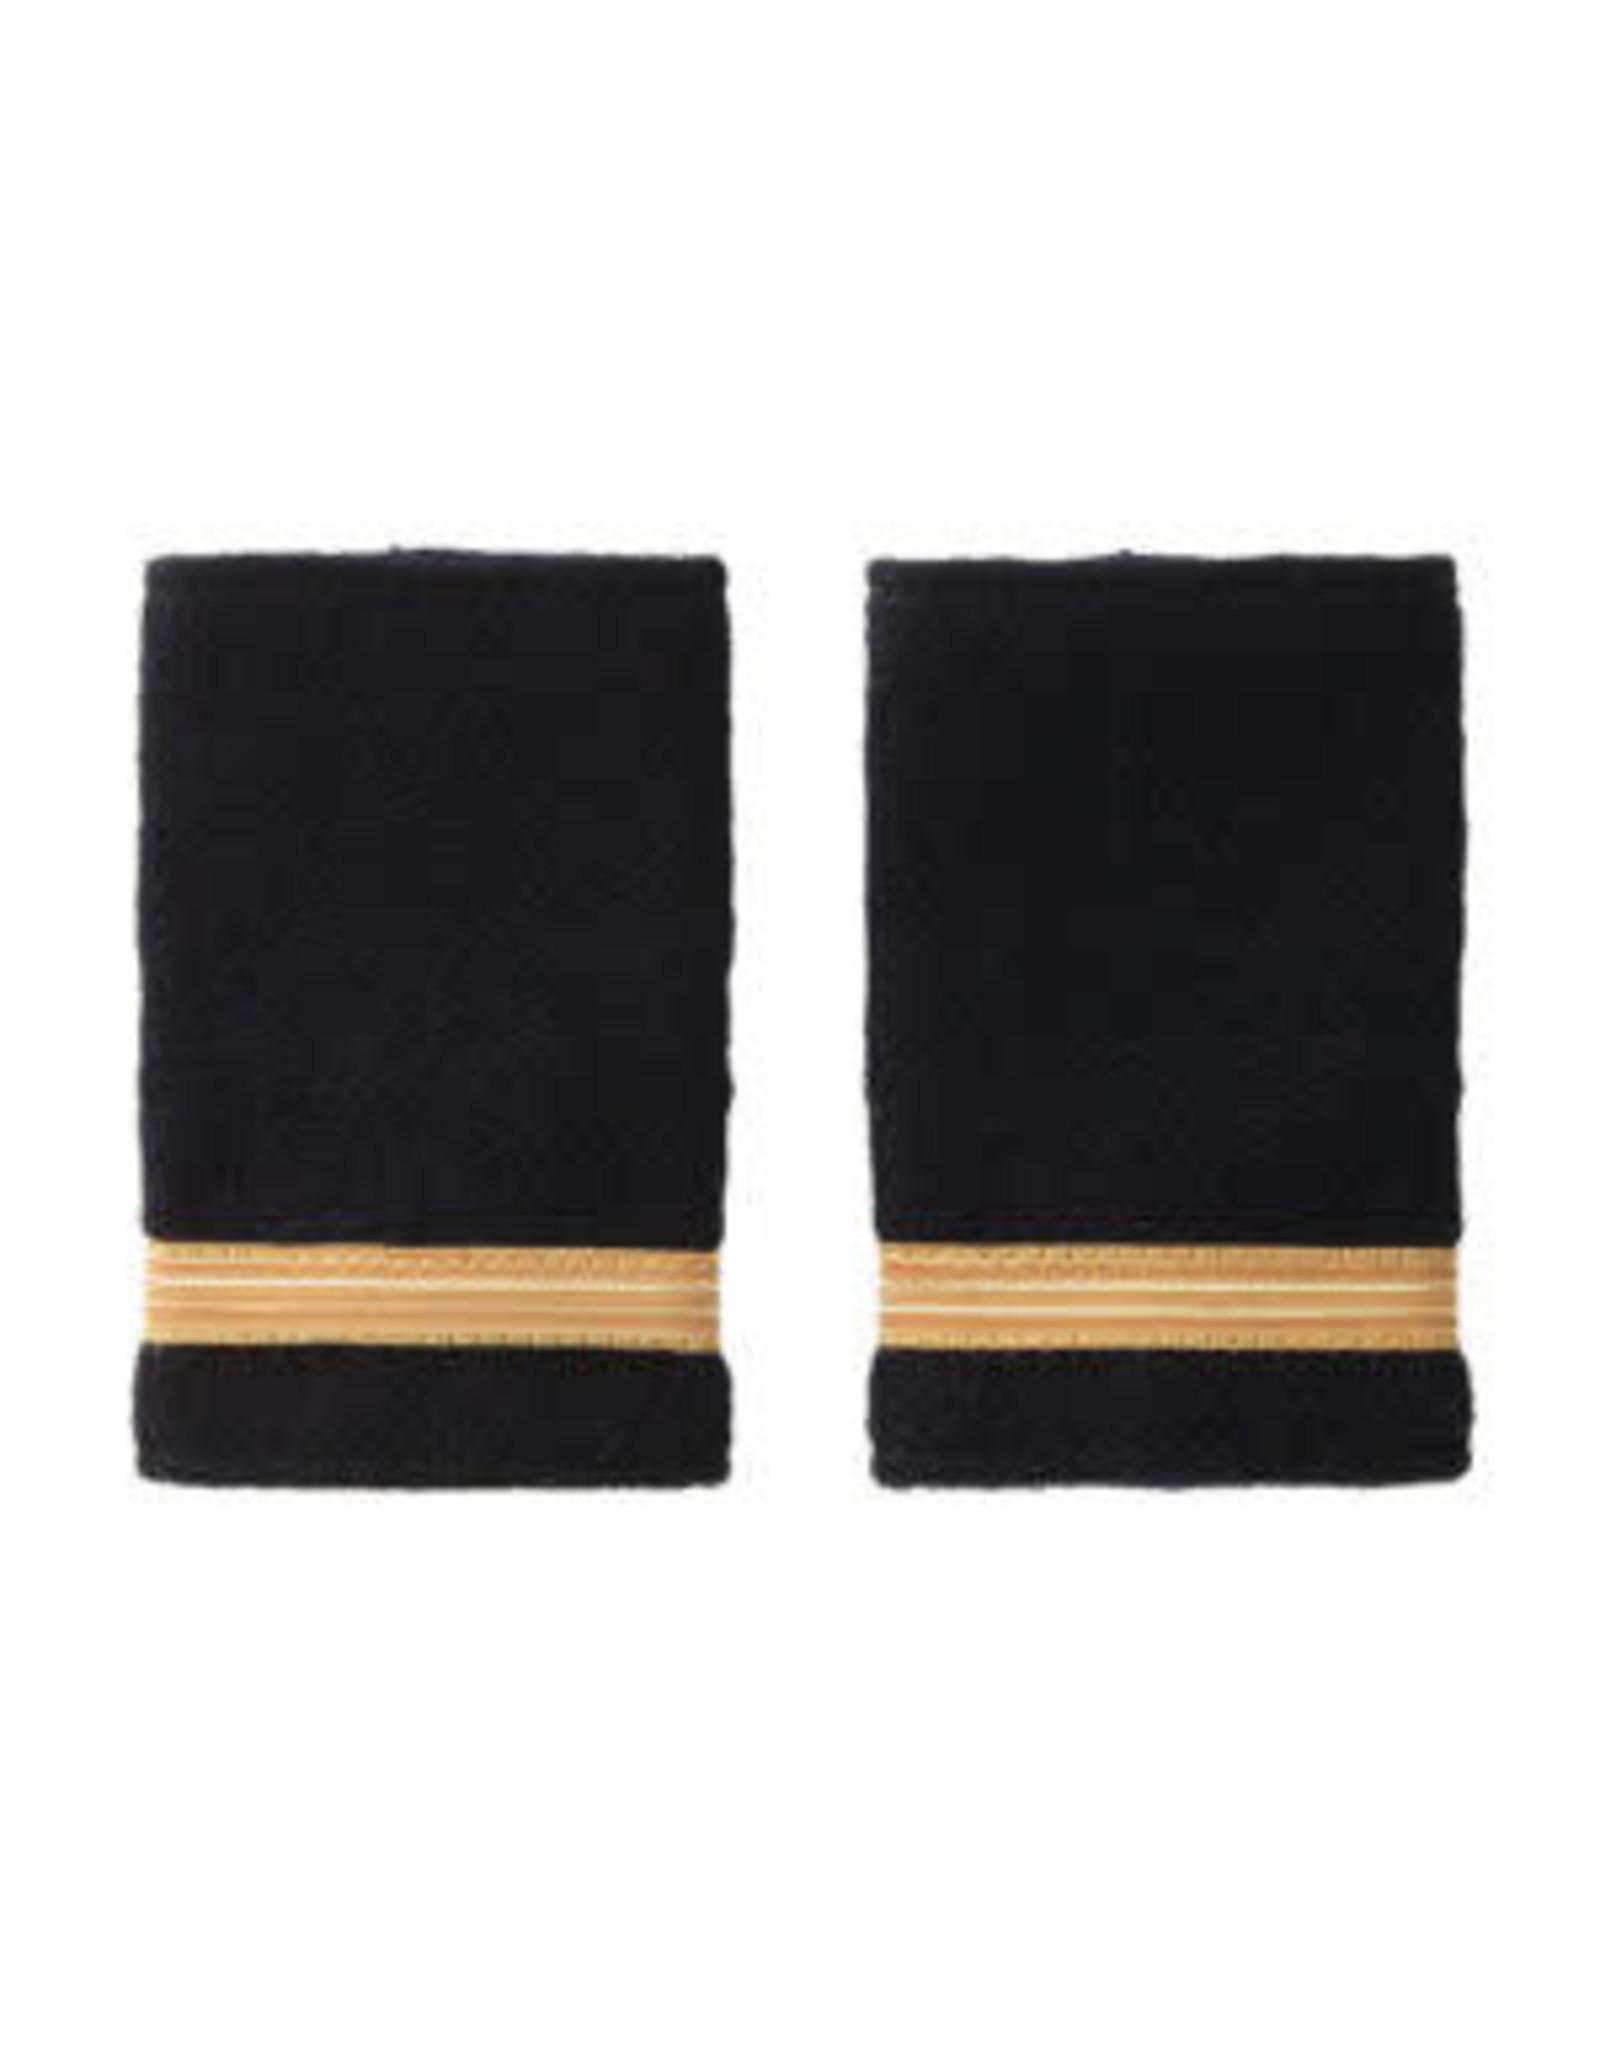 Passant Onder Officier 1 streep (2)